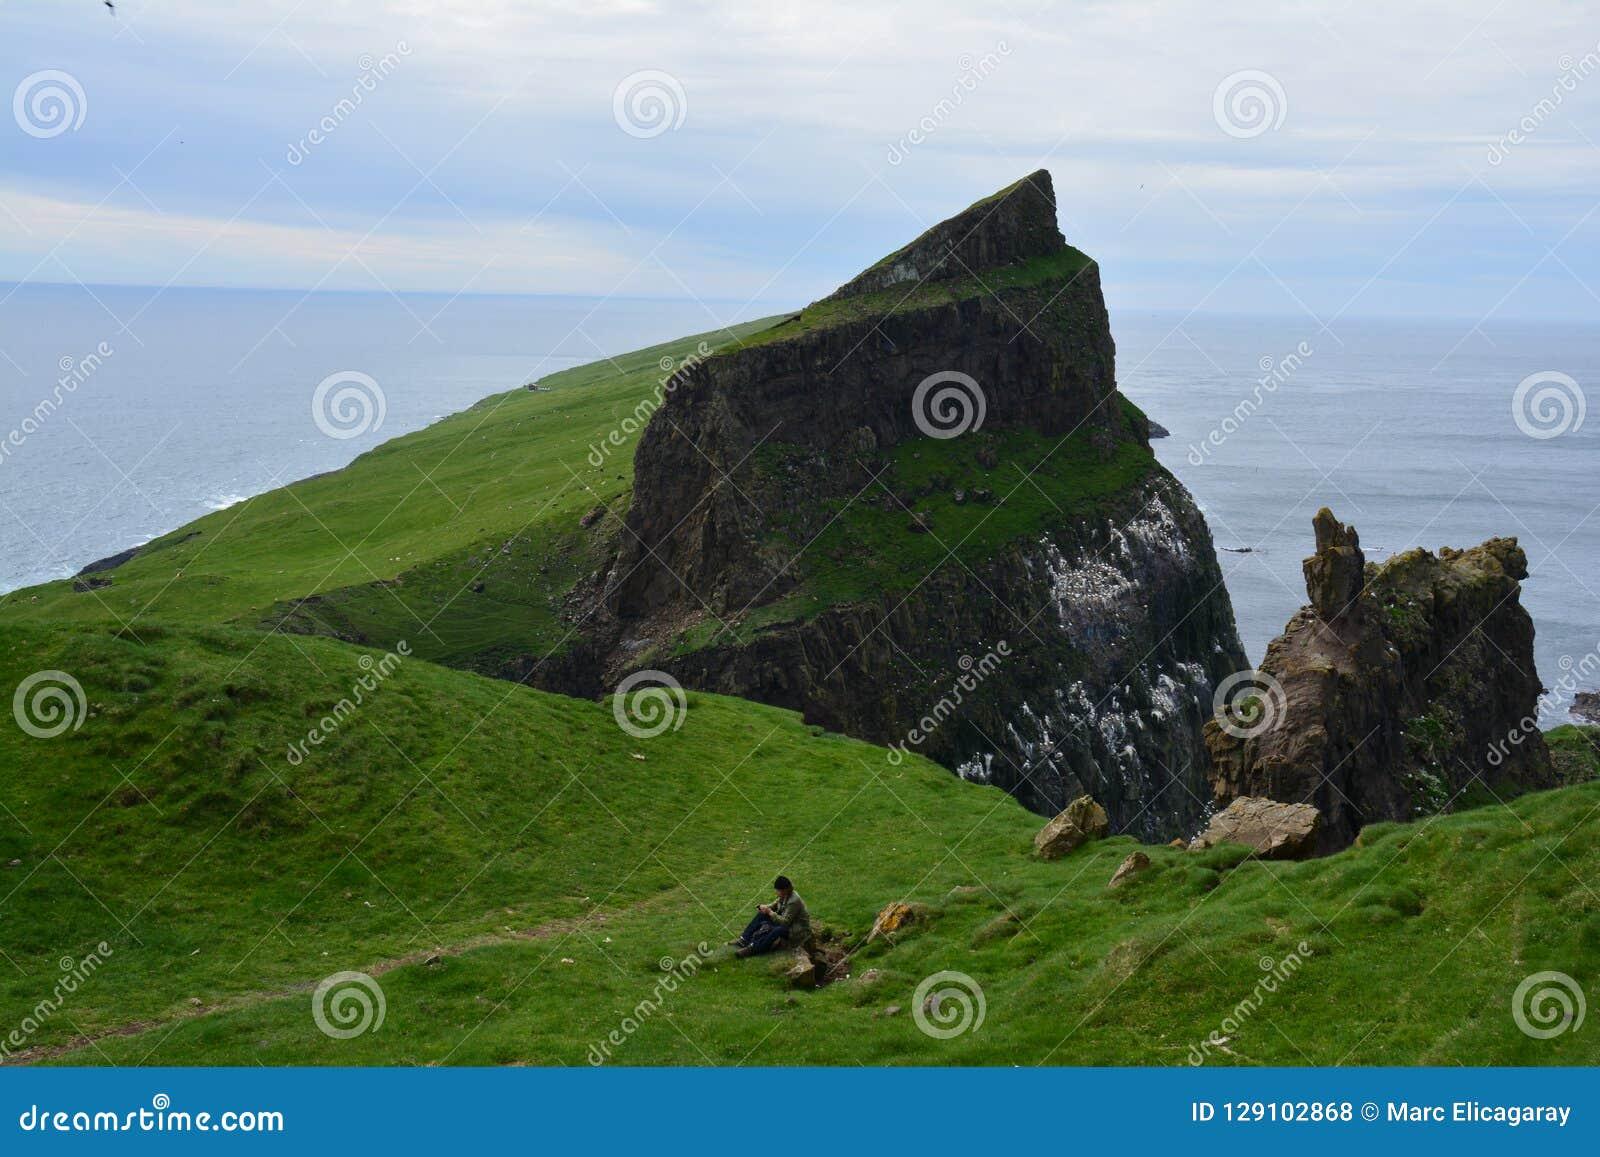 Ilha de Mykines em Ilhas Faroé